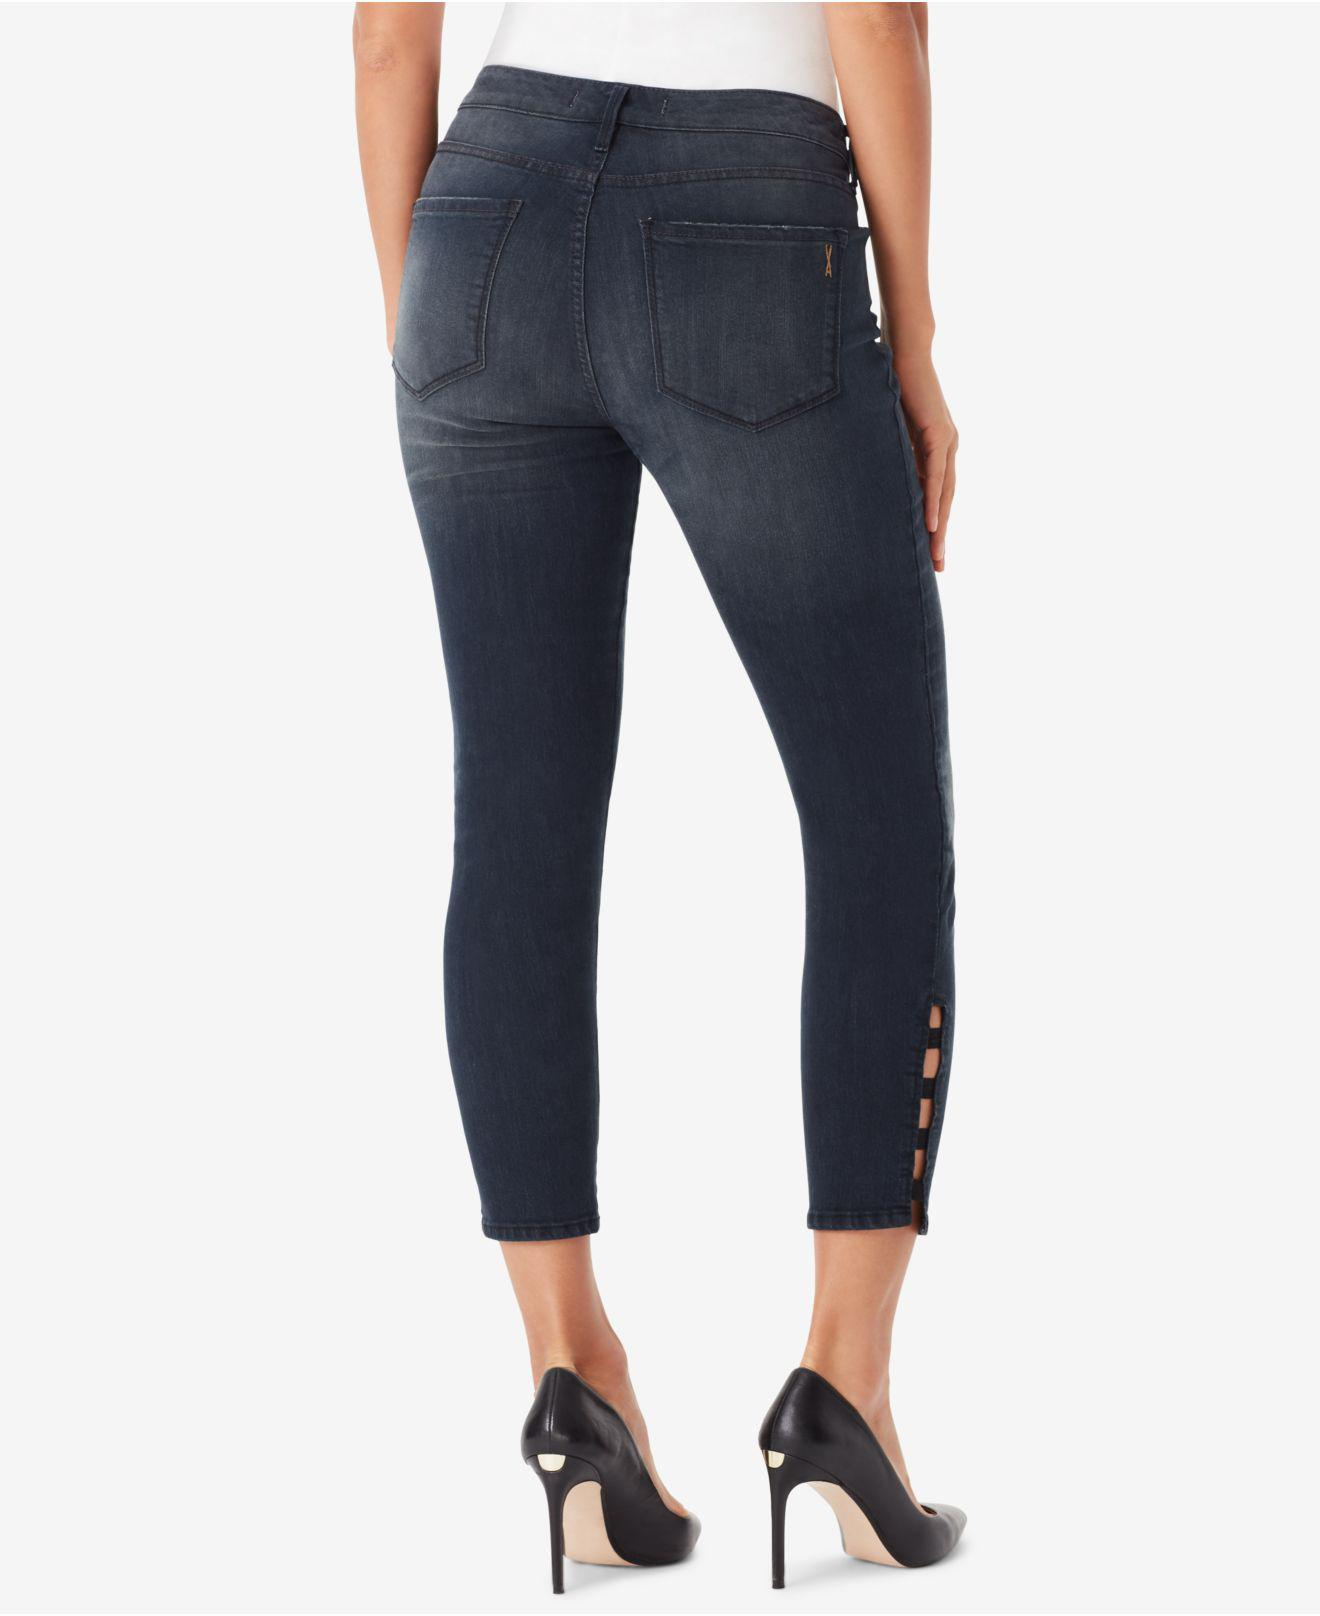 1db45353e66 Lyst - Vintage America Juniors  Wonderland Lattice Skinny Jeans in Blue